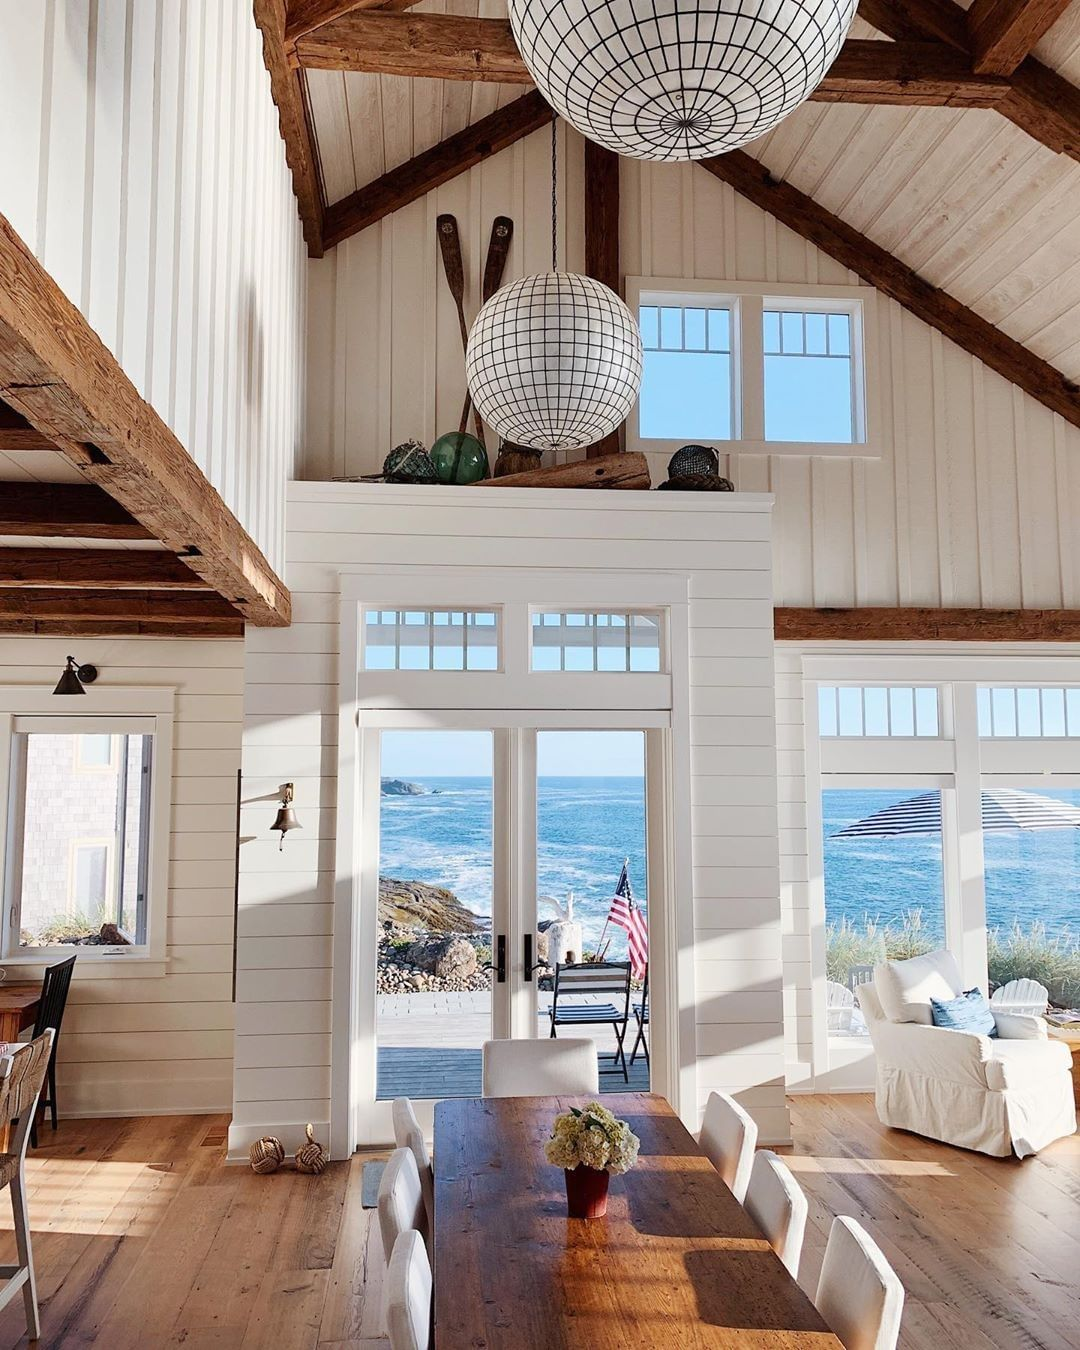 Design Home On Instagram Darlingiloveit We Love It This Gorgeous Beach Home Makes Us Wish We Were Still In Weeken Home Beautiful Beach Houses House Design